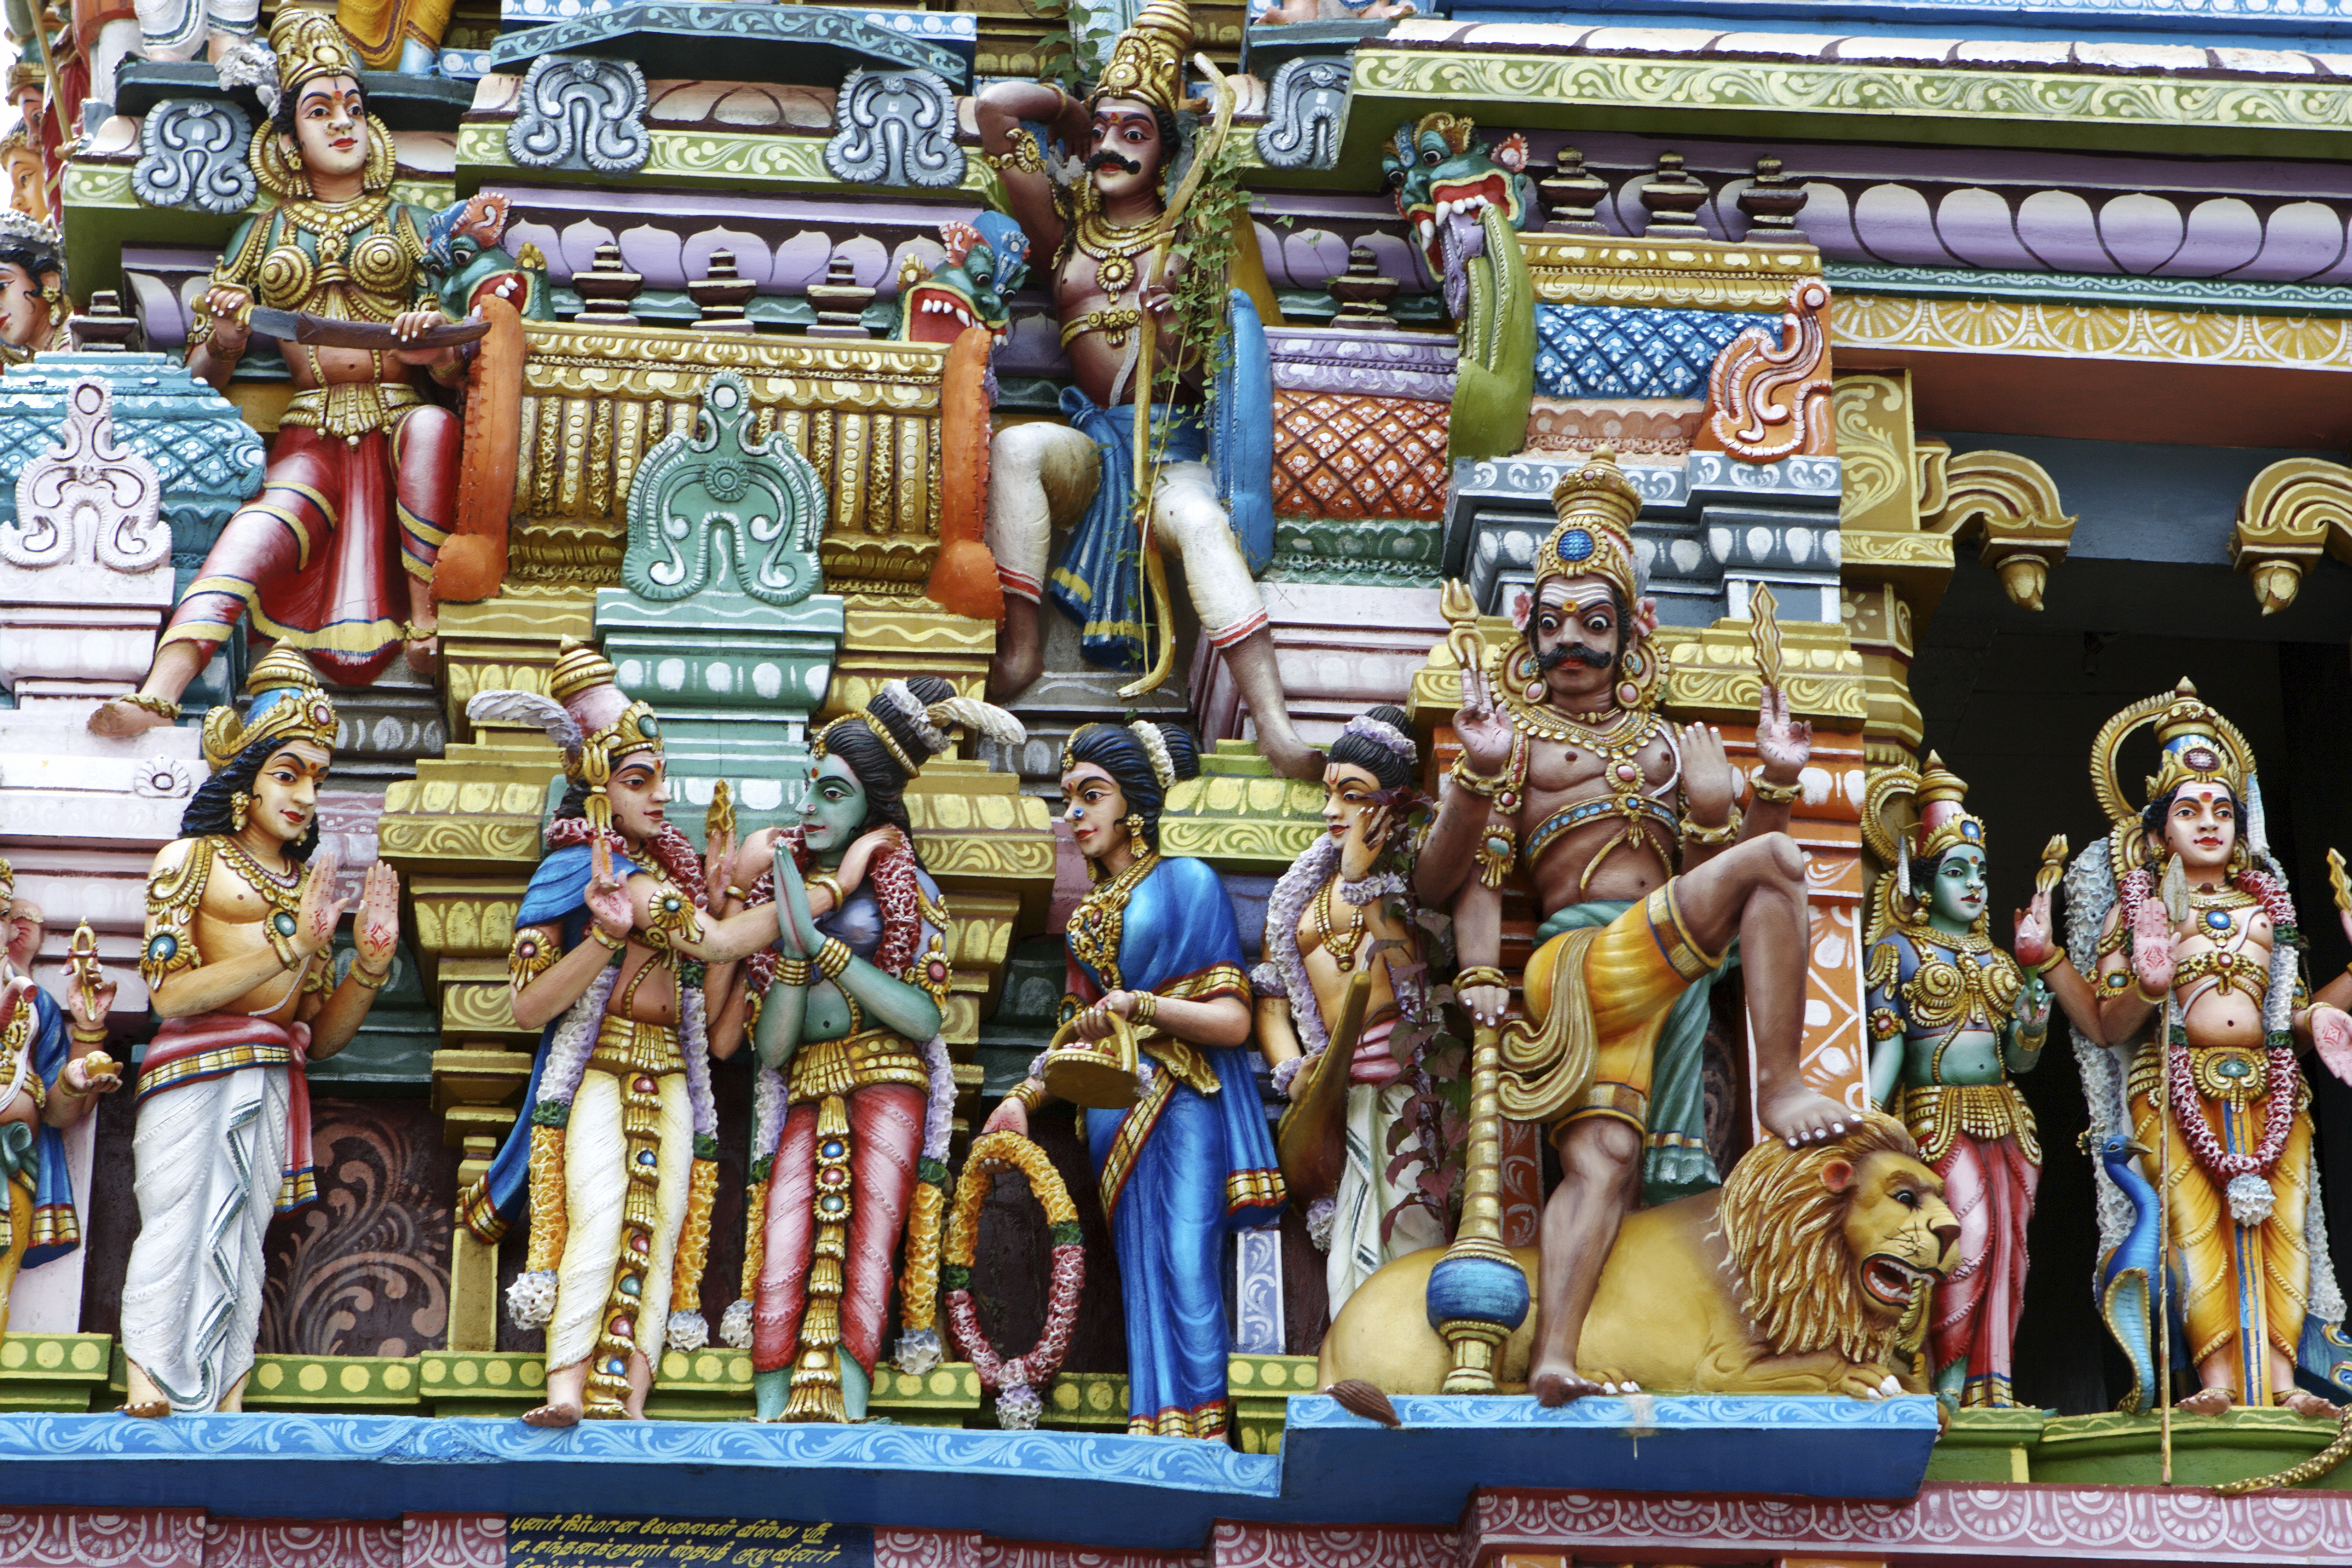 Hindu temple in Sri Lanka's capital Colombo